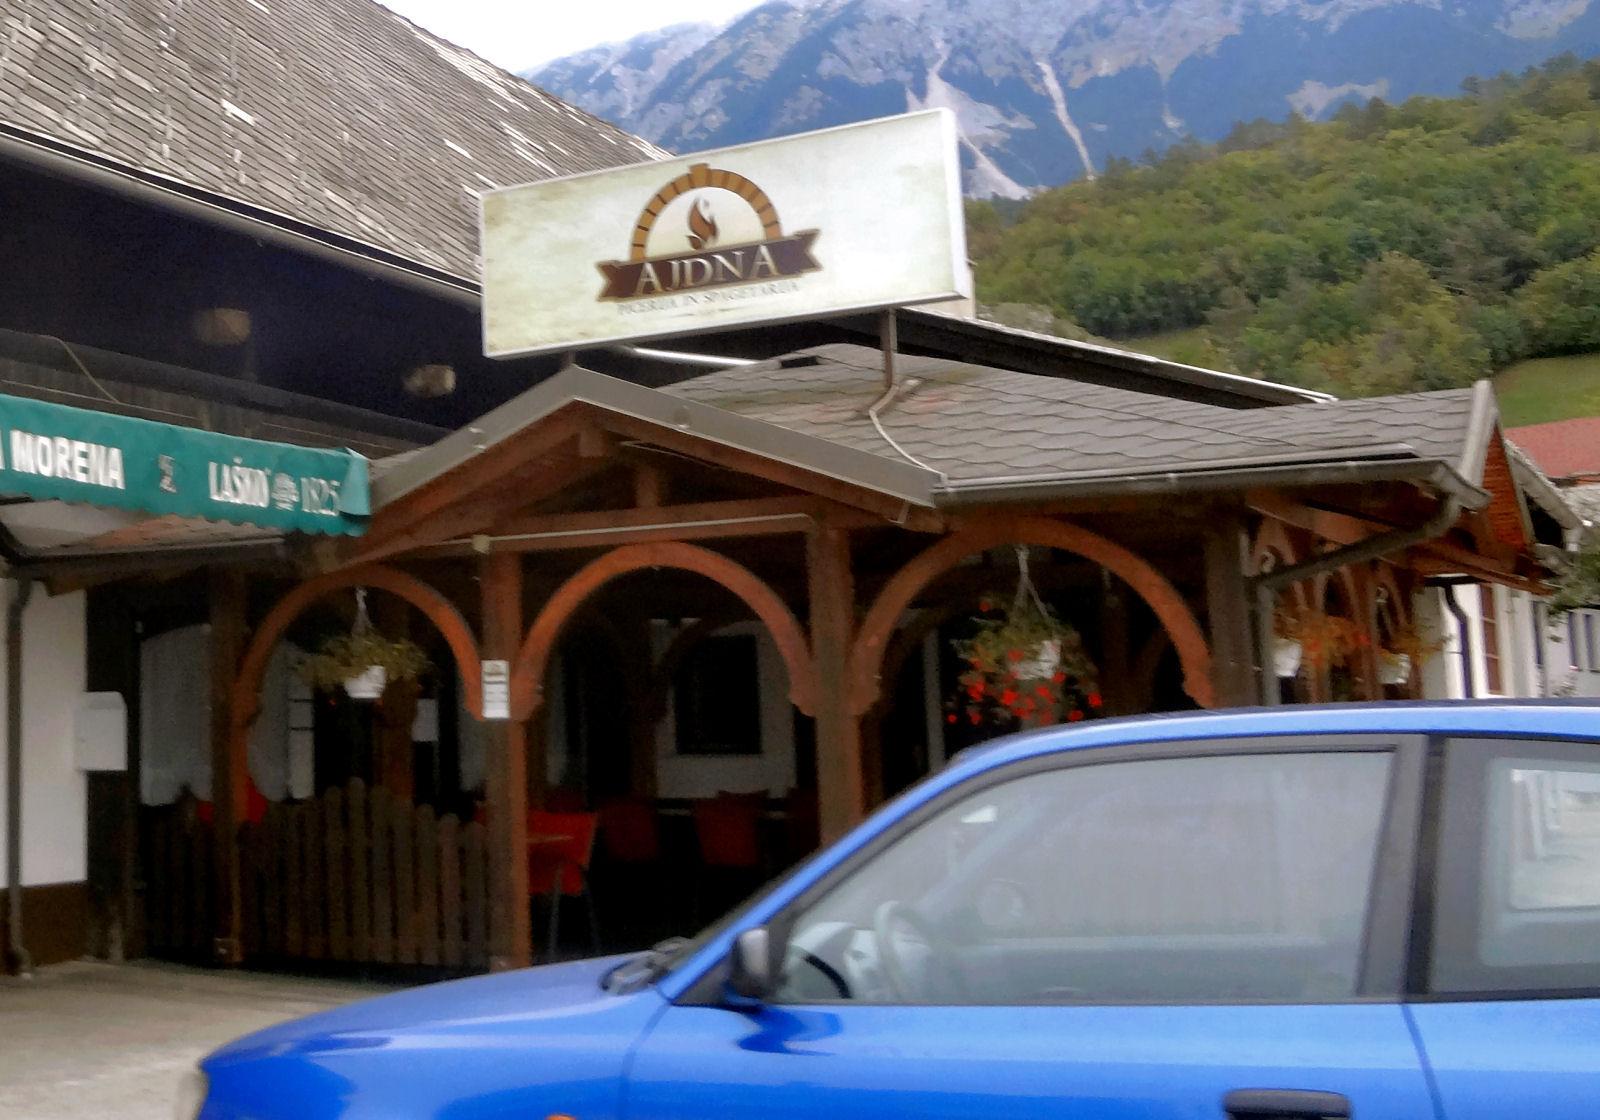 pizzeria-spaghetteria-ajdna-entrance